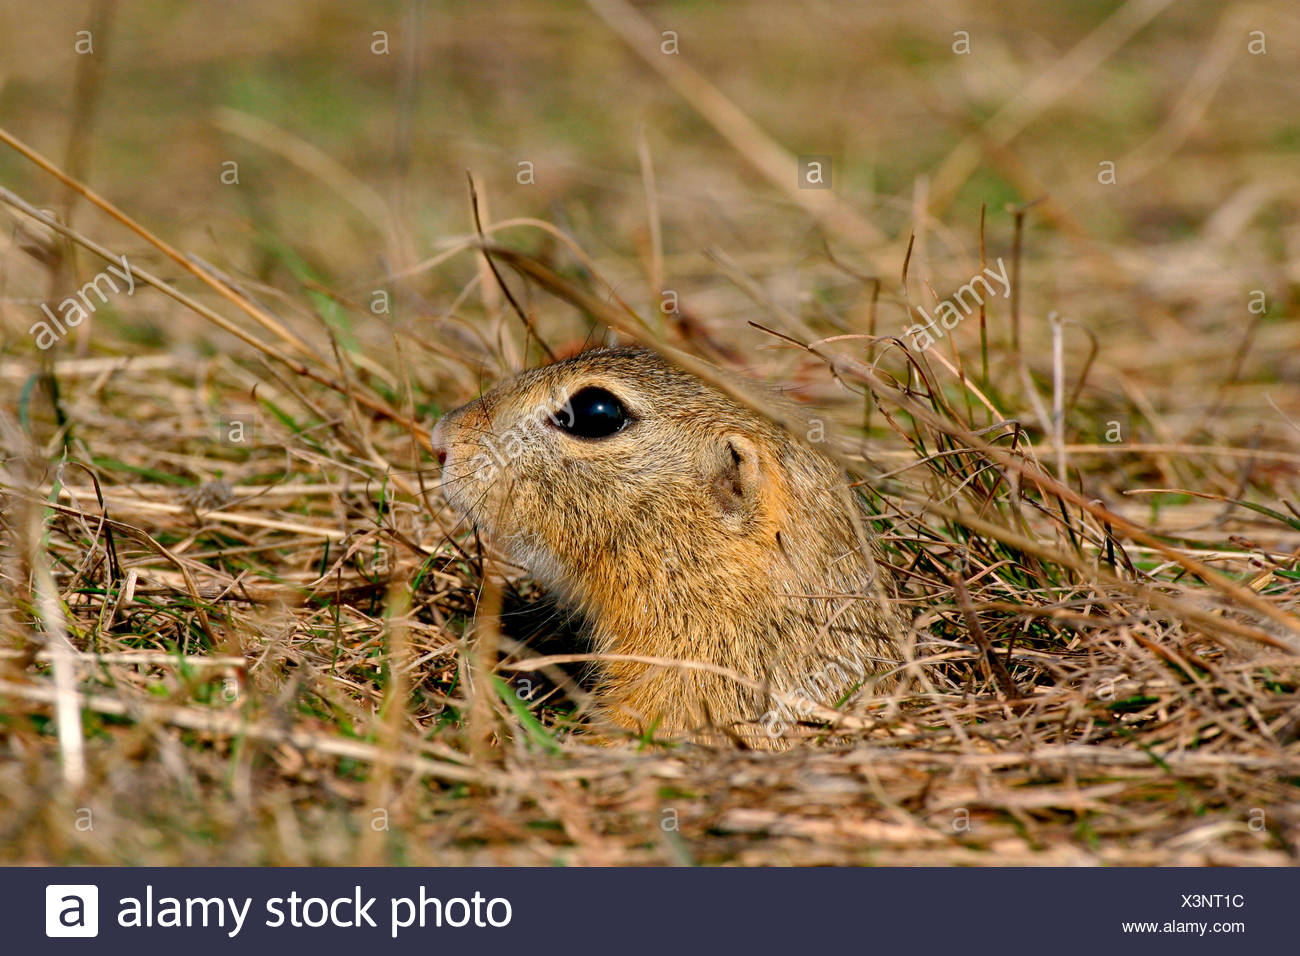 Ziesel (Spermophilus citellus) European ground squirrel Stock Photo